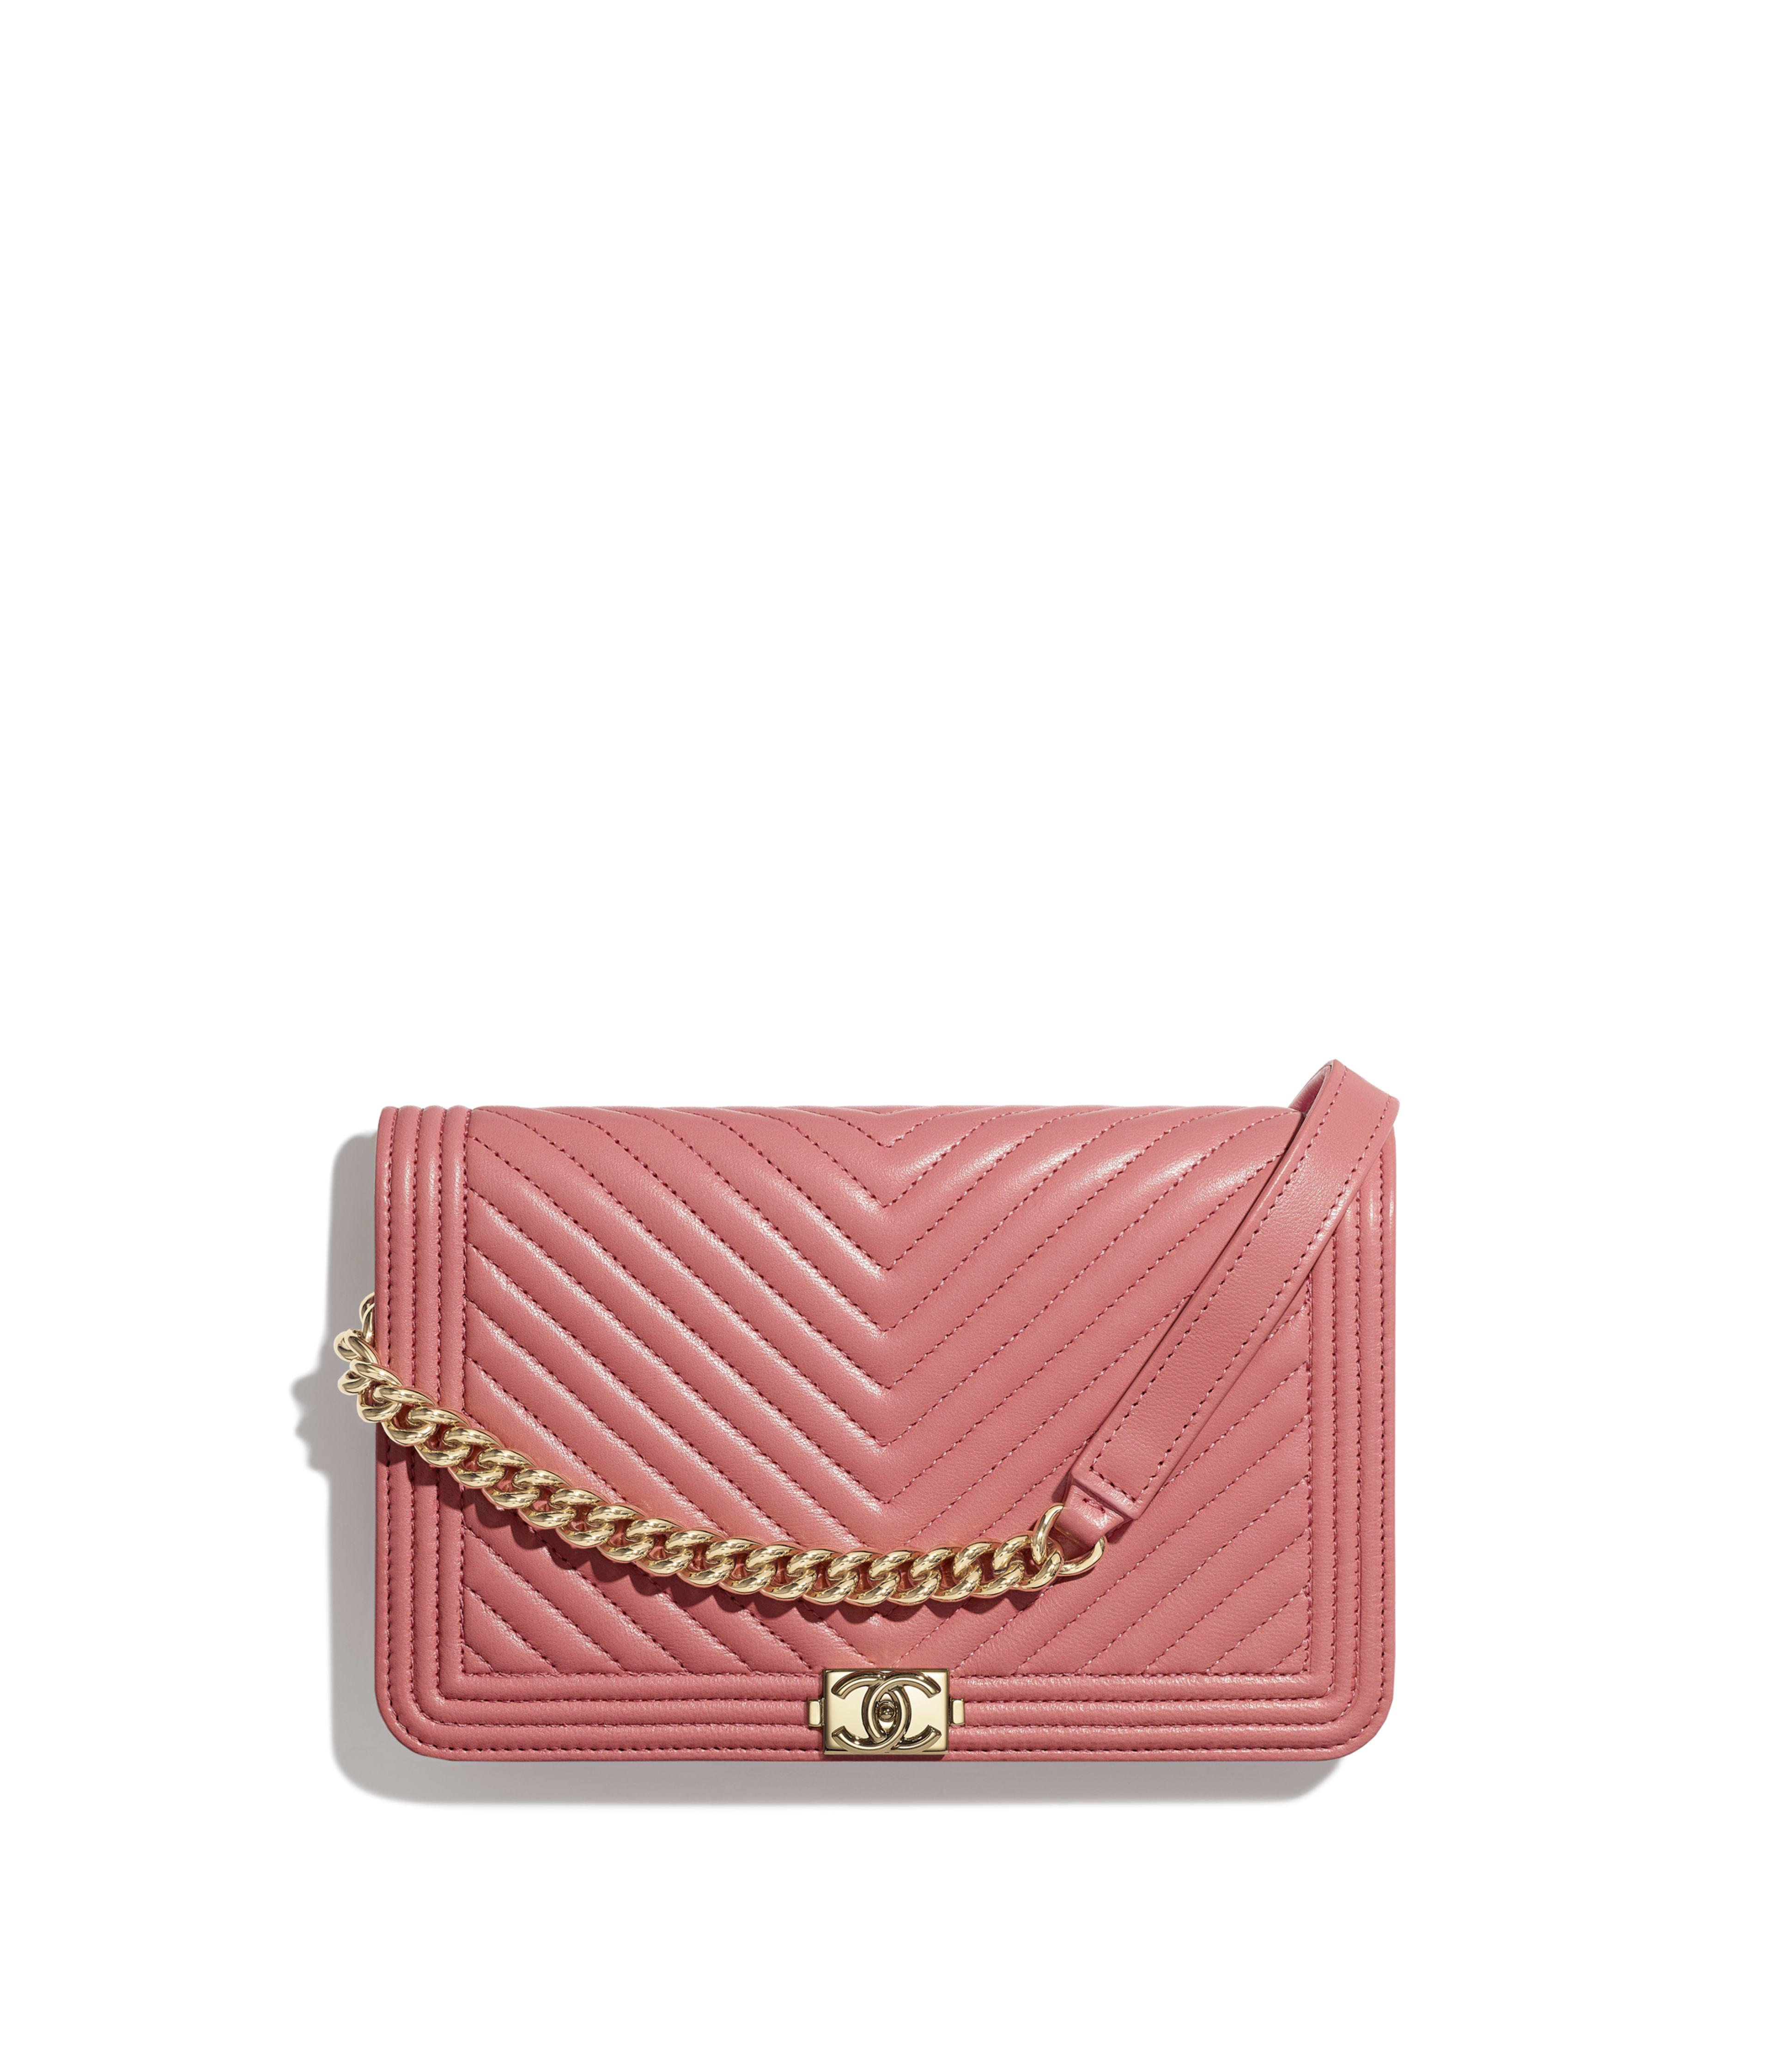 c40b4efd2bb221 BOY CHANEL Wallet on Chain Lambskin & Gold-Tone Metal, Pink Ref.  A81969B00635N4704